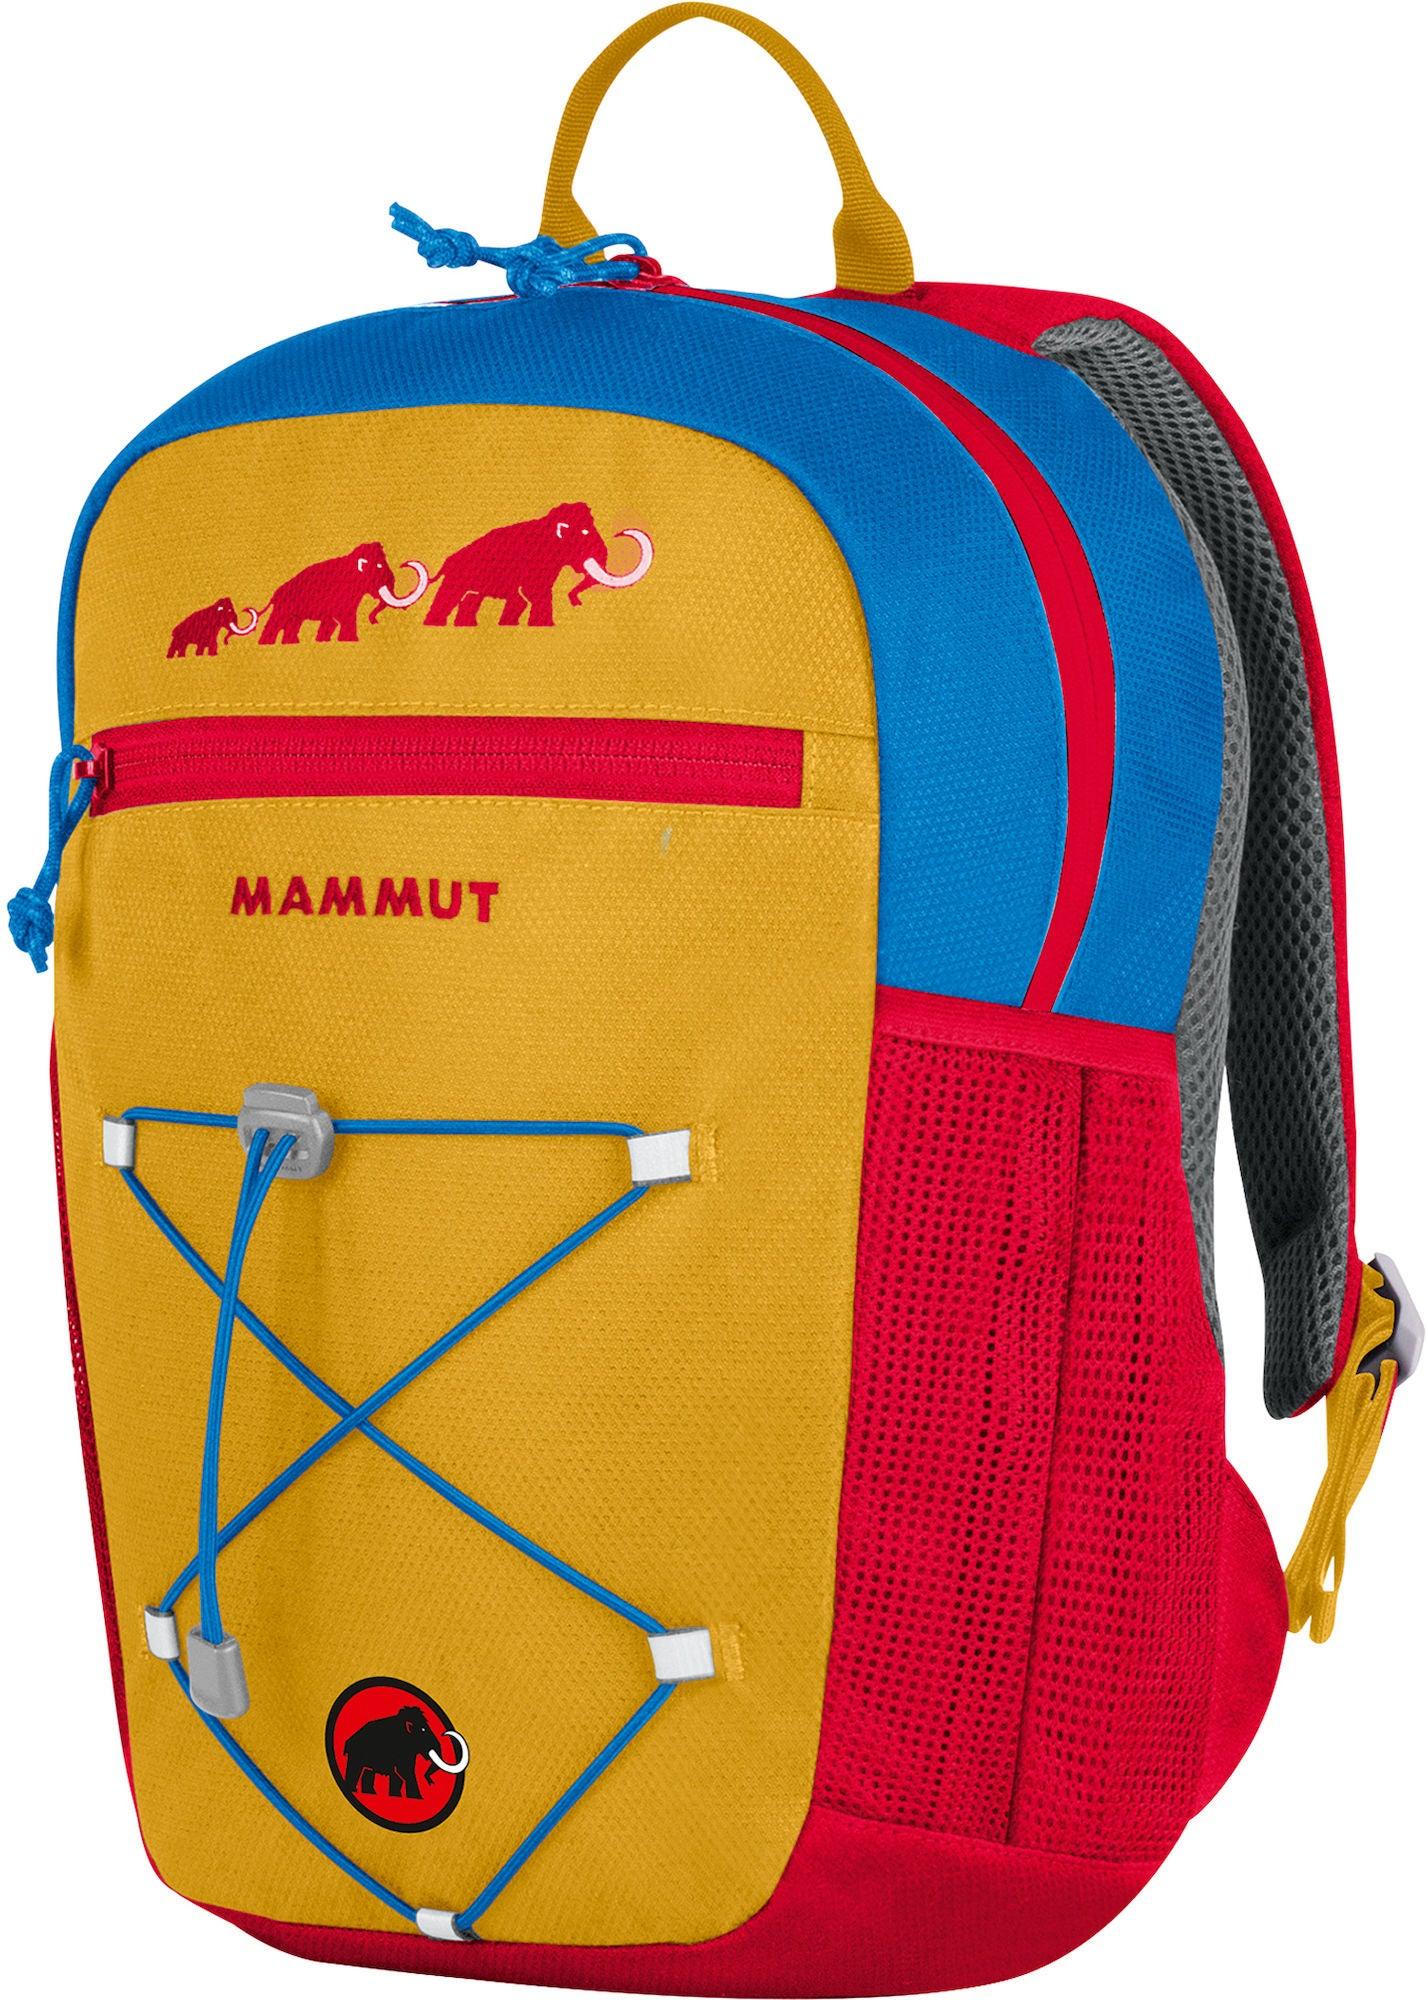 Mammut First Zip Ryggsekk 16L, Fancy